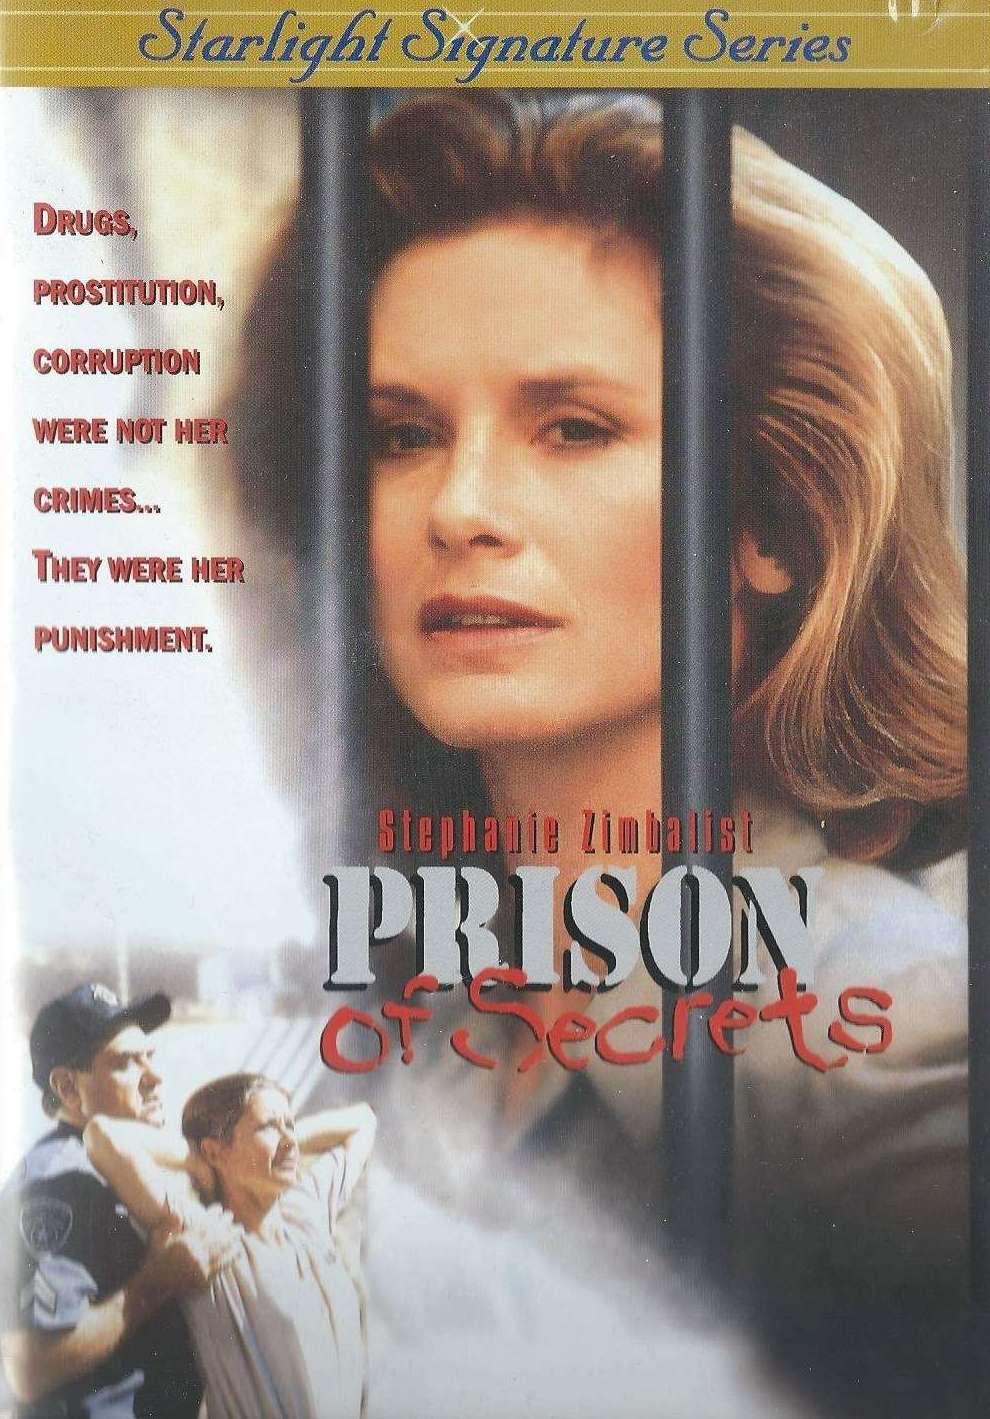 Prison of Secrets (1997) DVDRip XviD 700MB